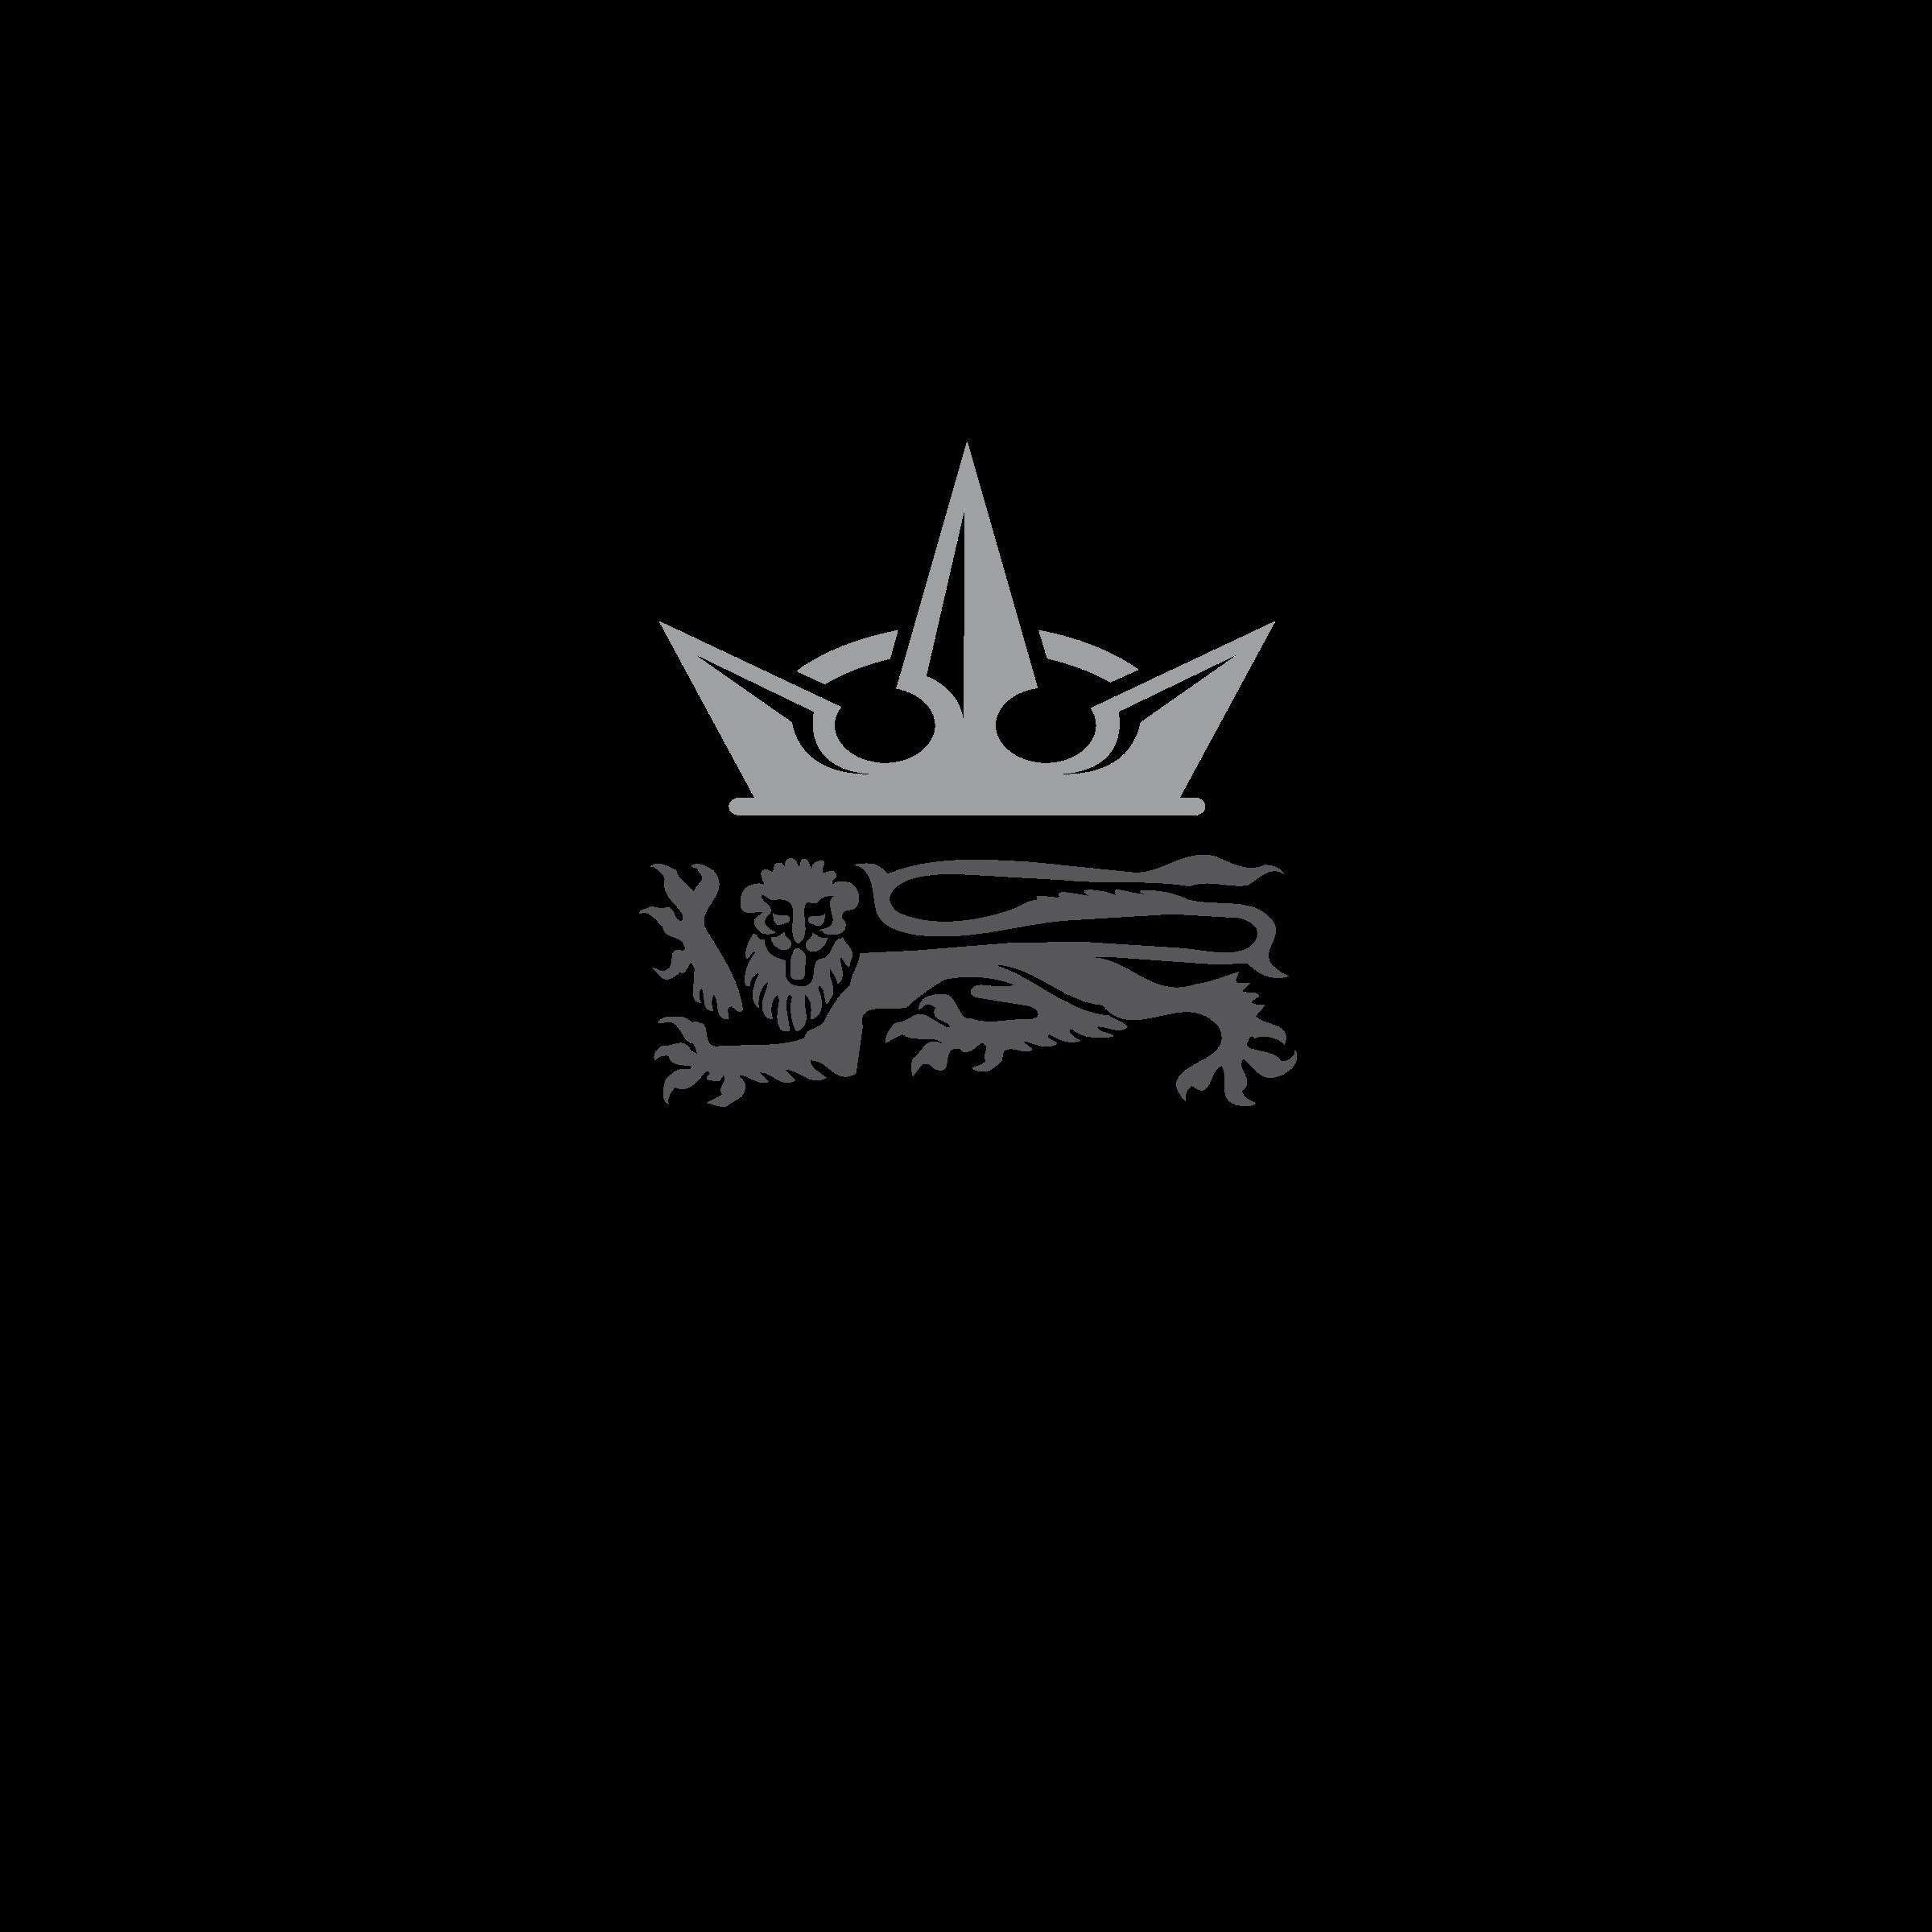 jersey-finance-logo-png-transparent